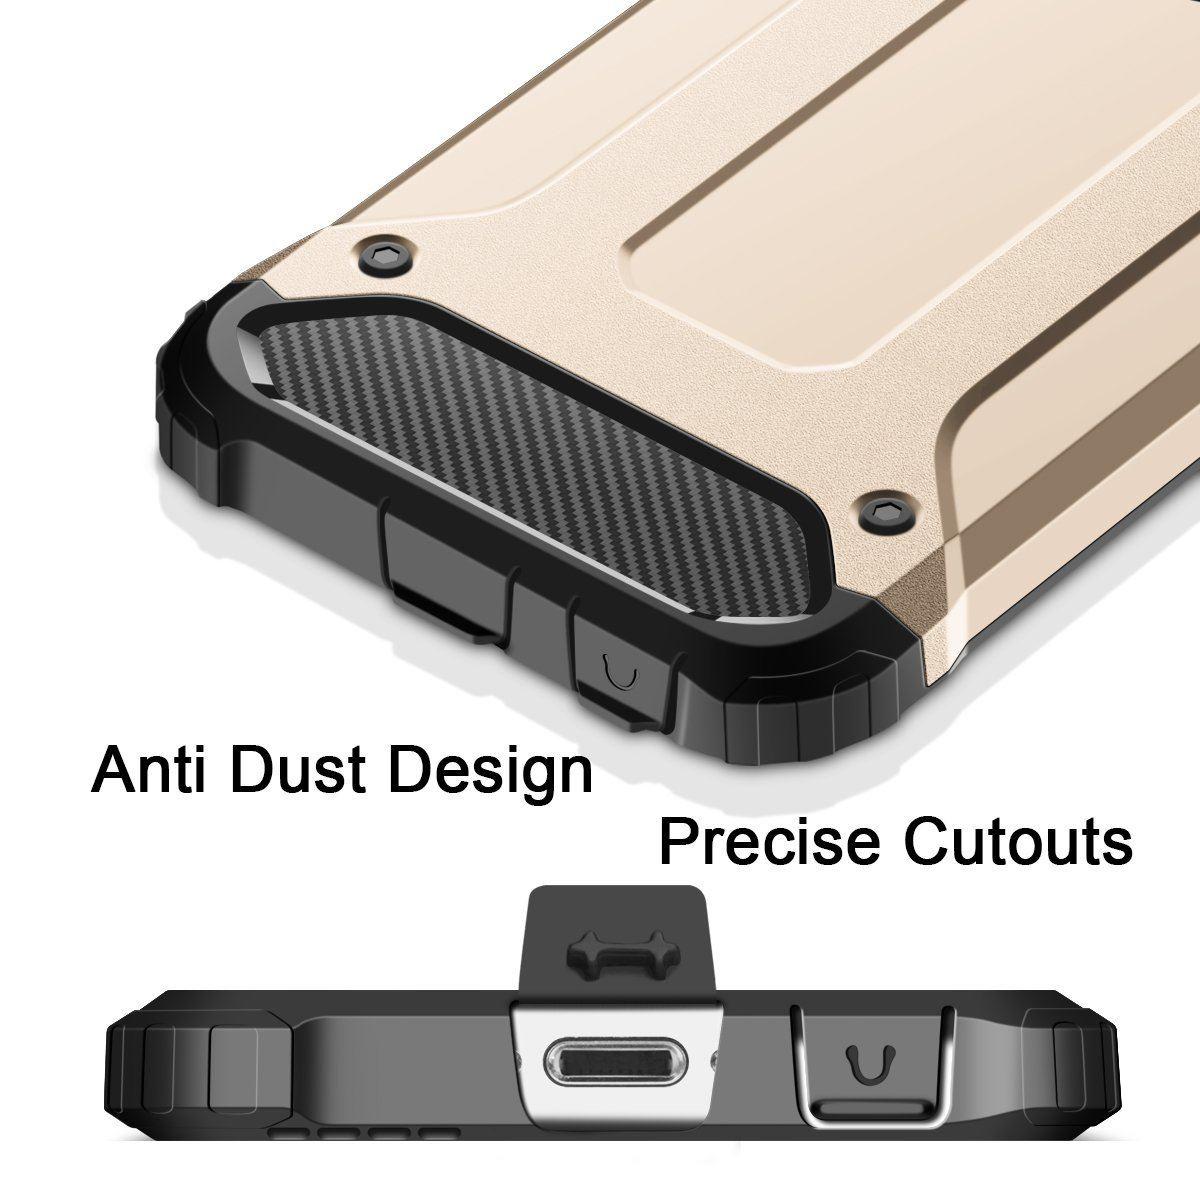 thumbnail 23 - For Apple iPhone 11 Pro Max XR Xs X 8 7 Plus 6 5 Se Case Cover Tough Armor